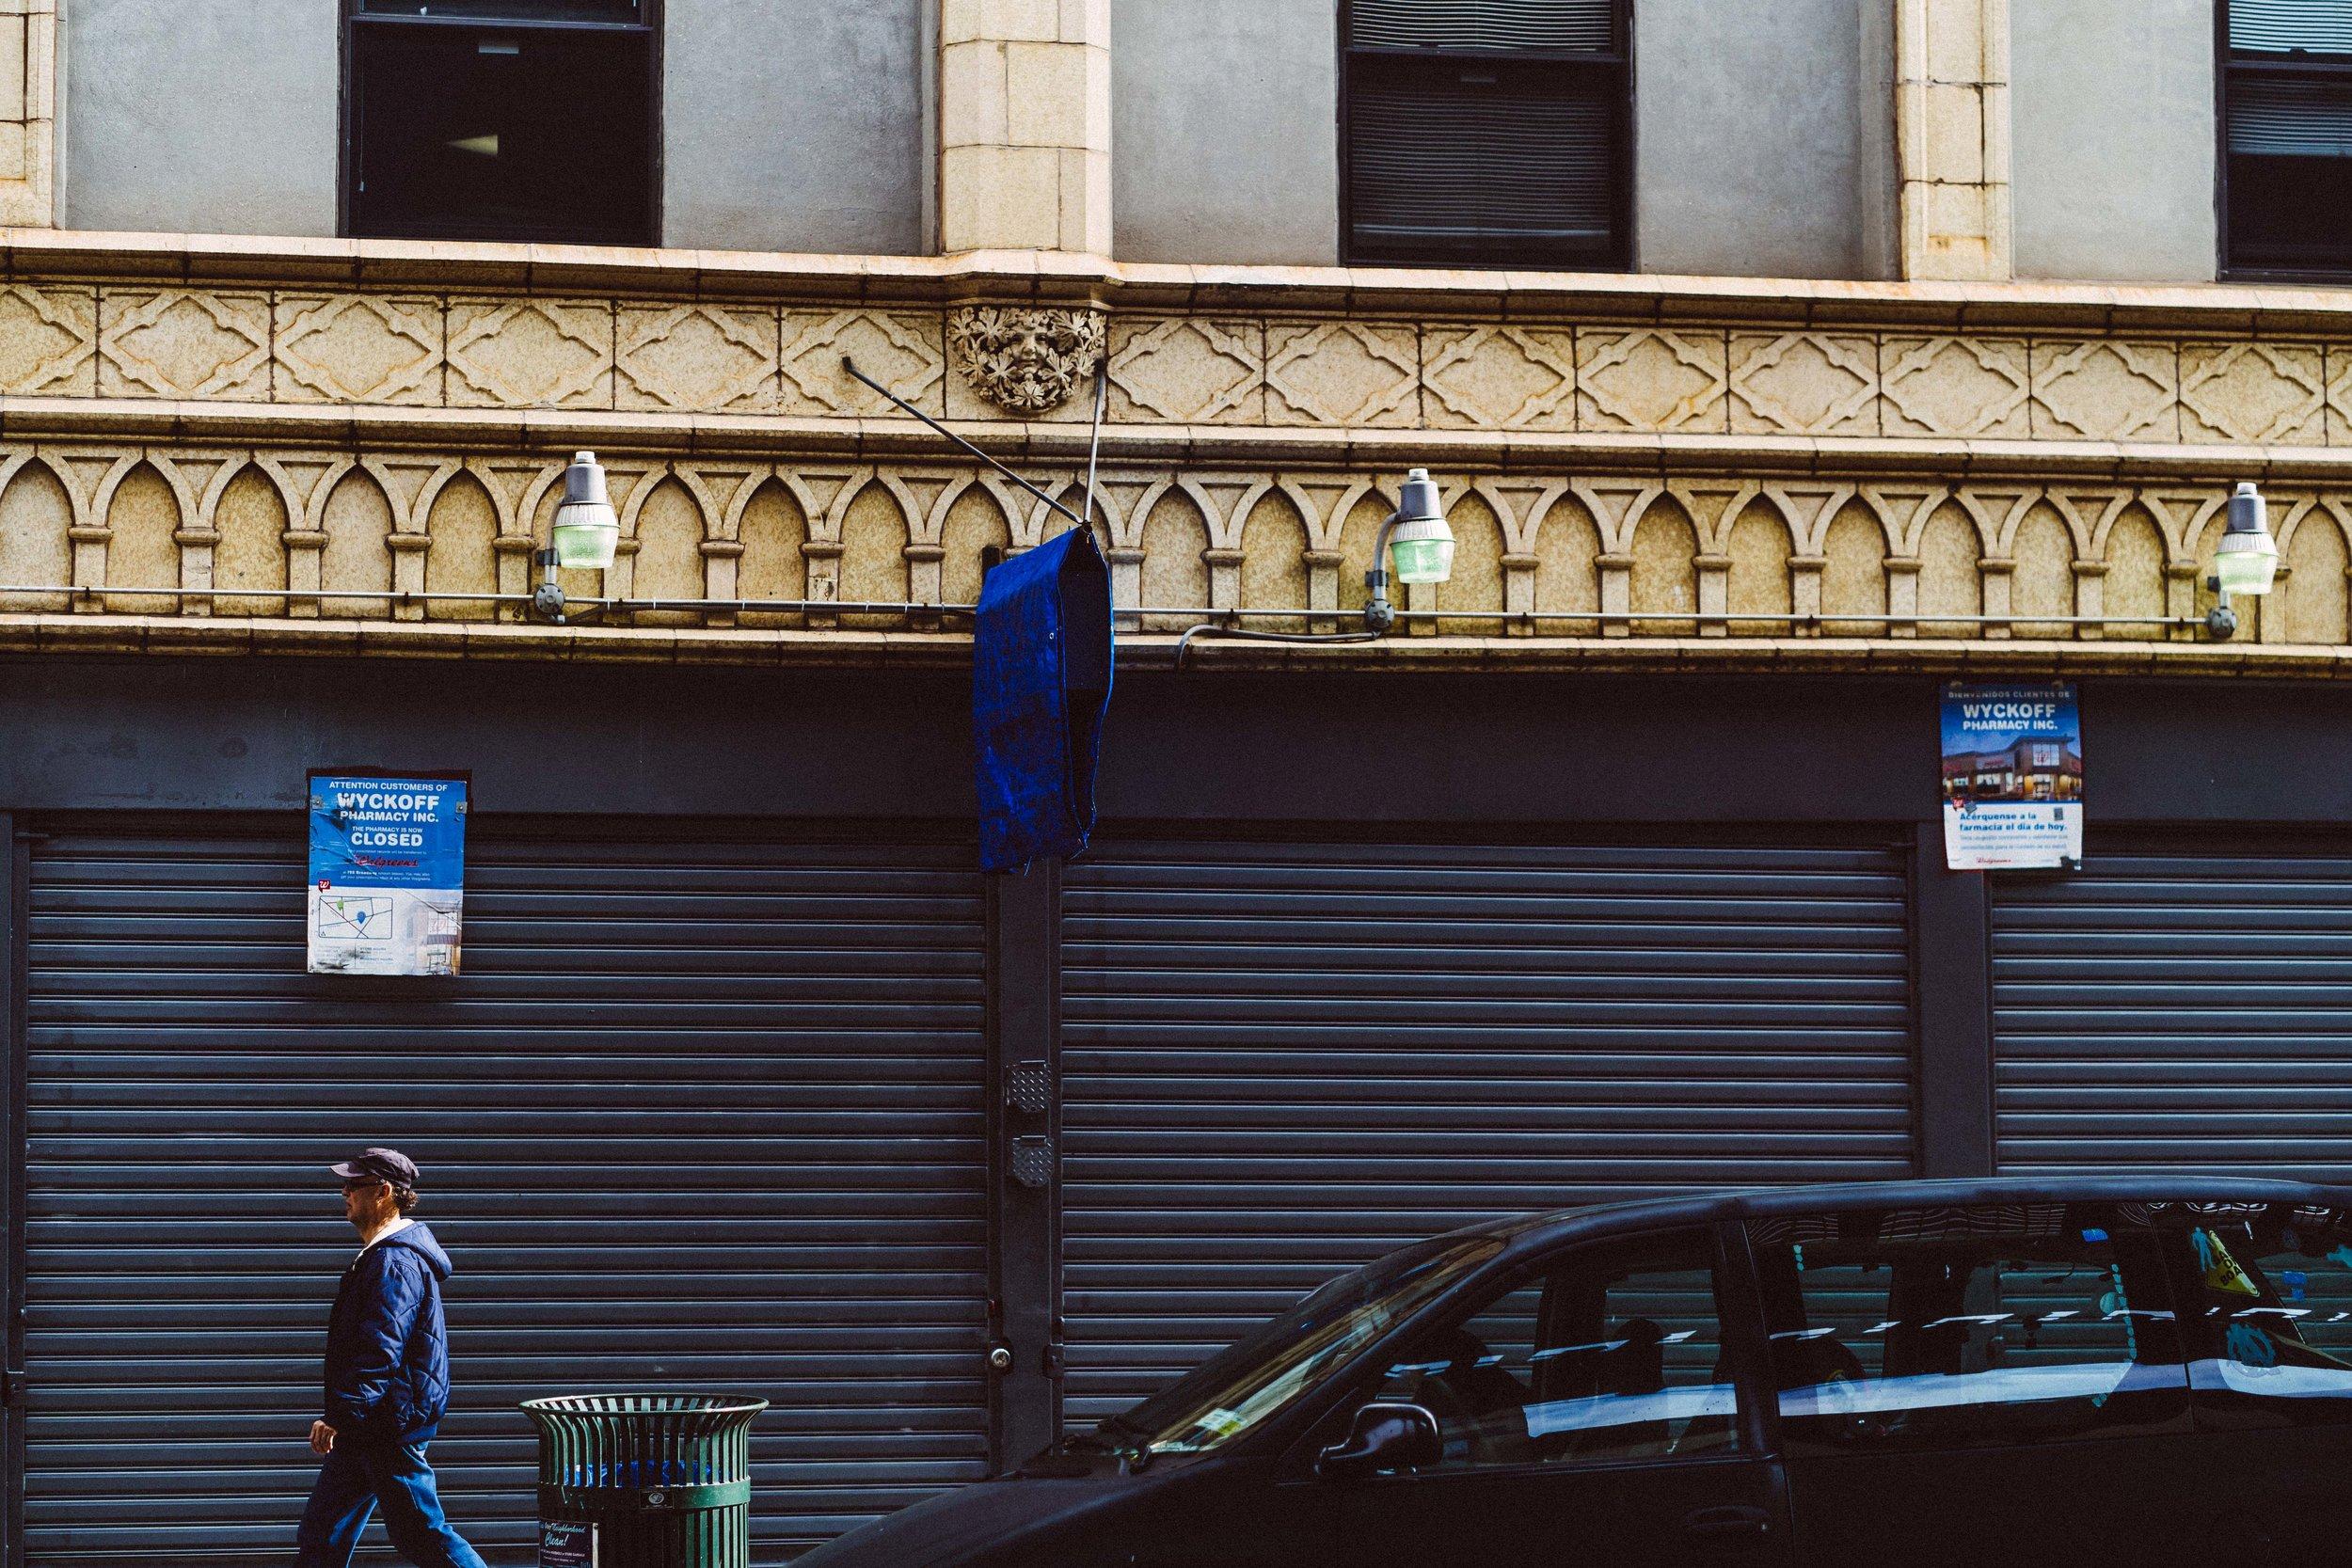 newyork-sony-101525.jpg